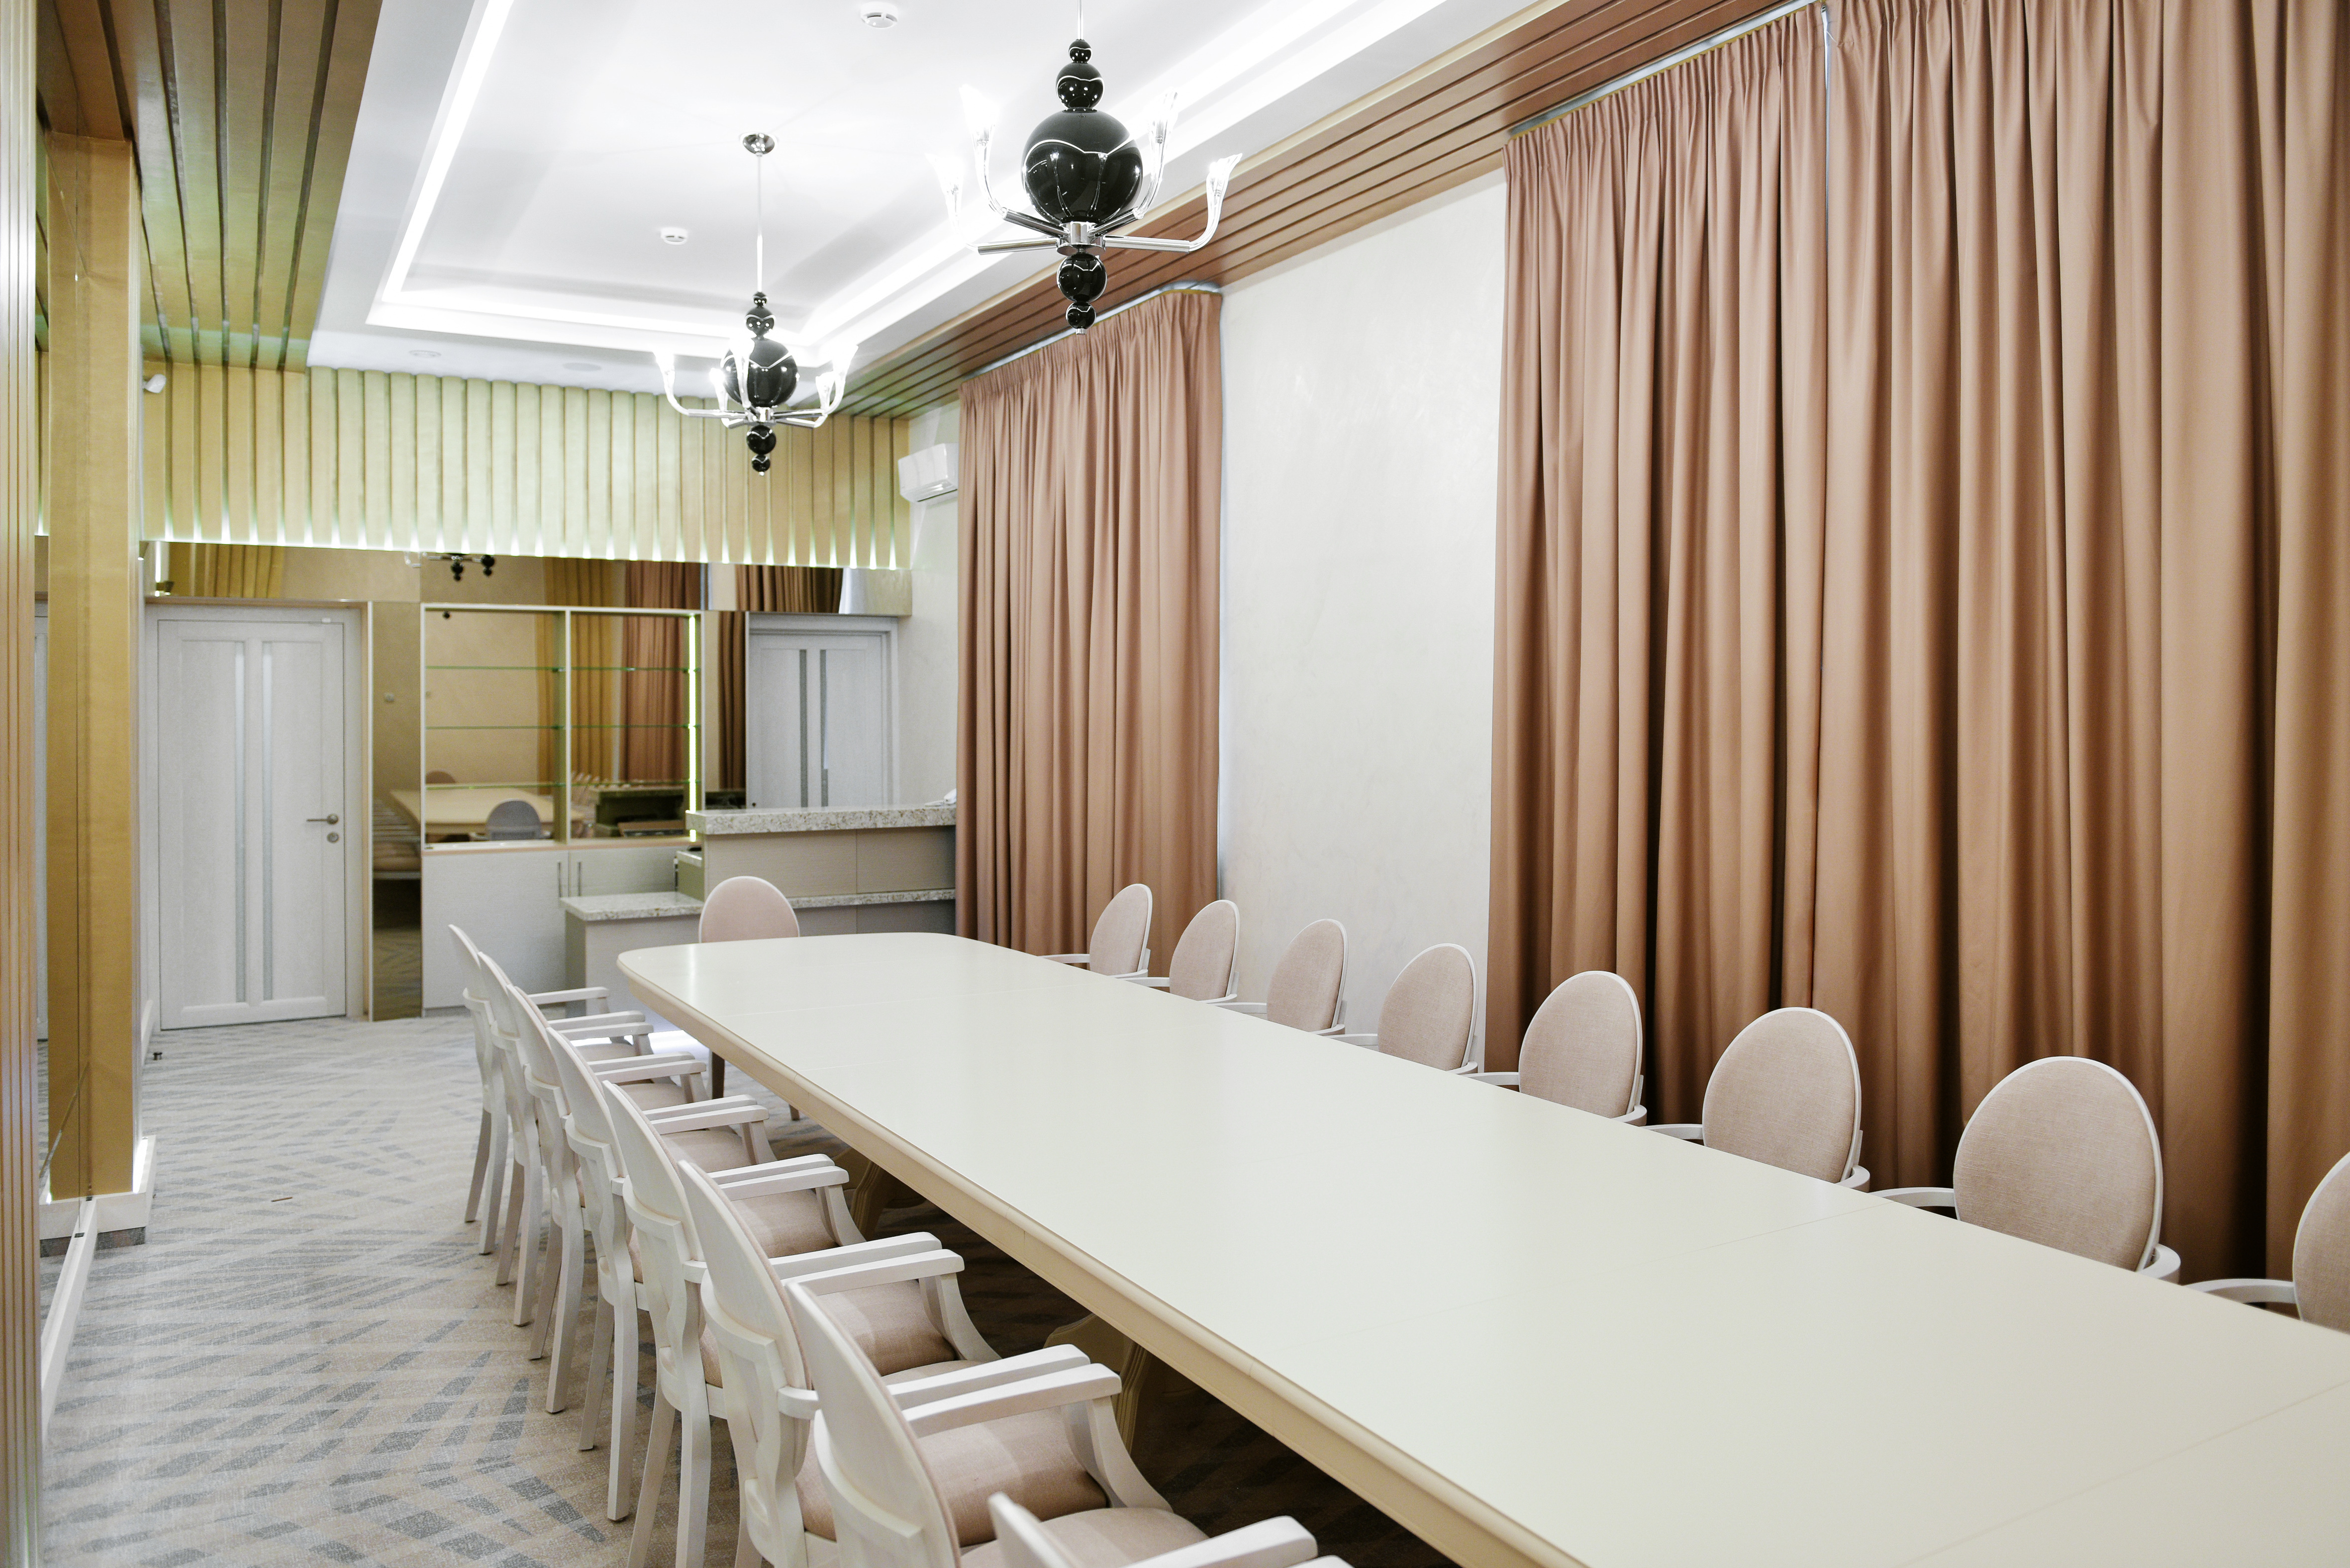 Банкетный зал iskrahall.ru